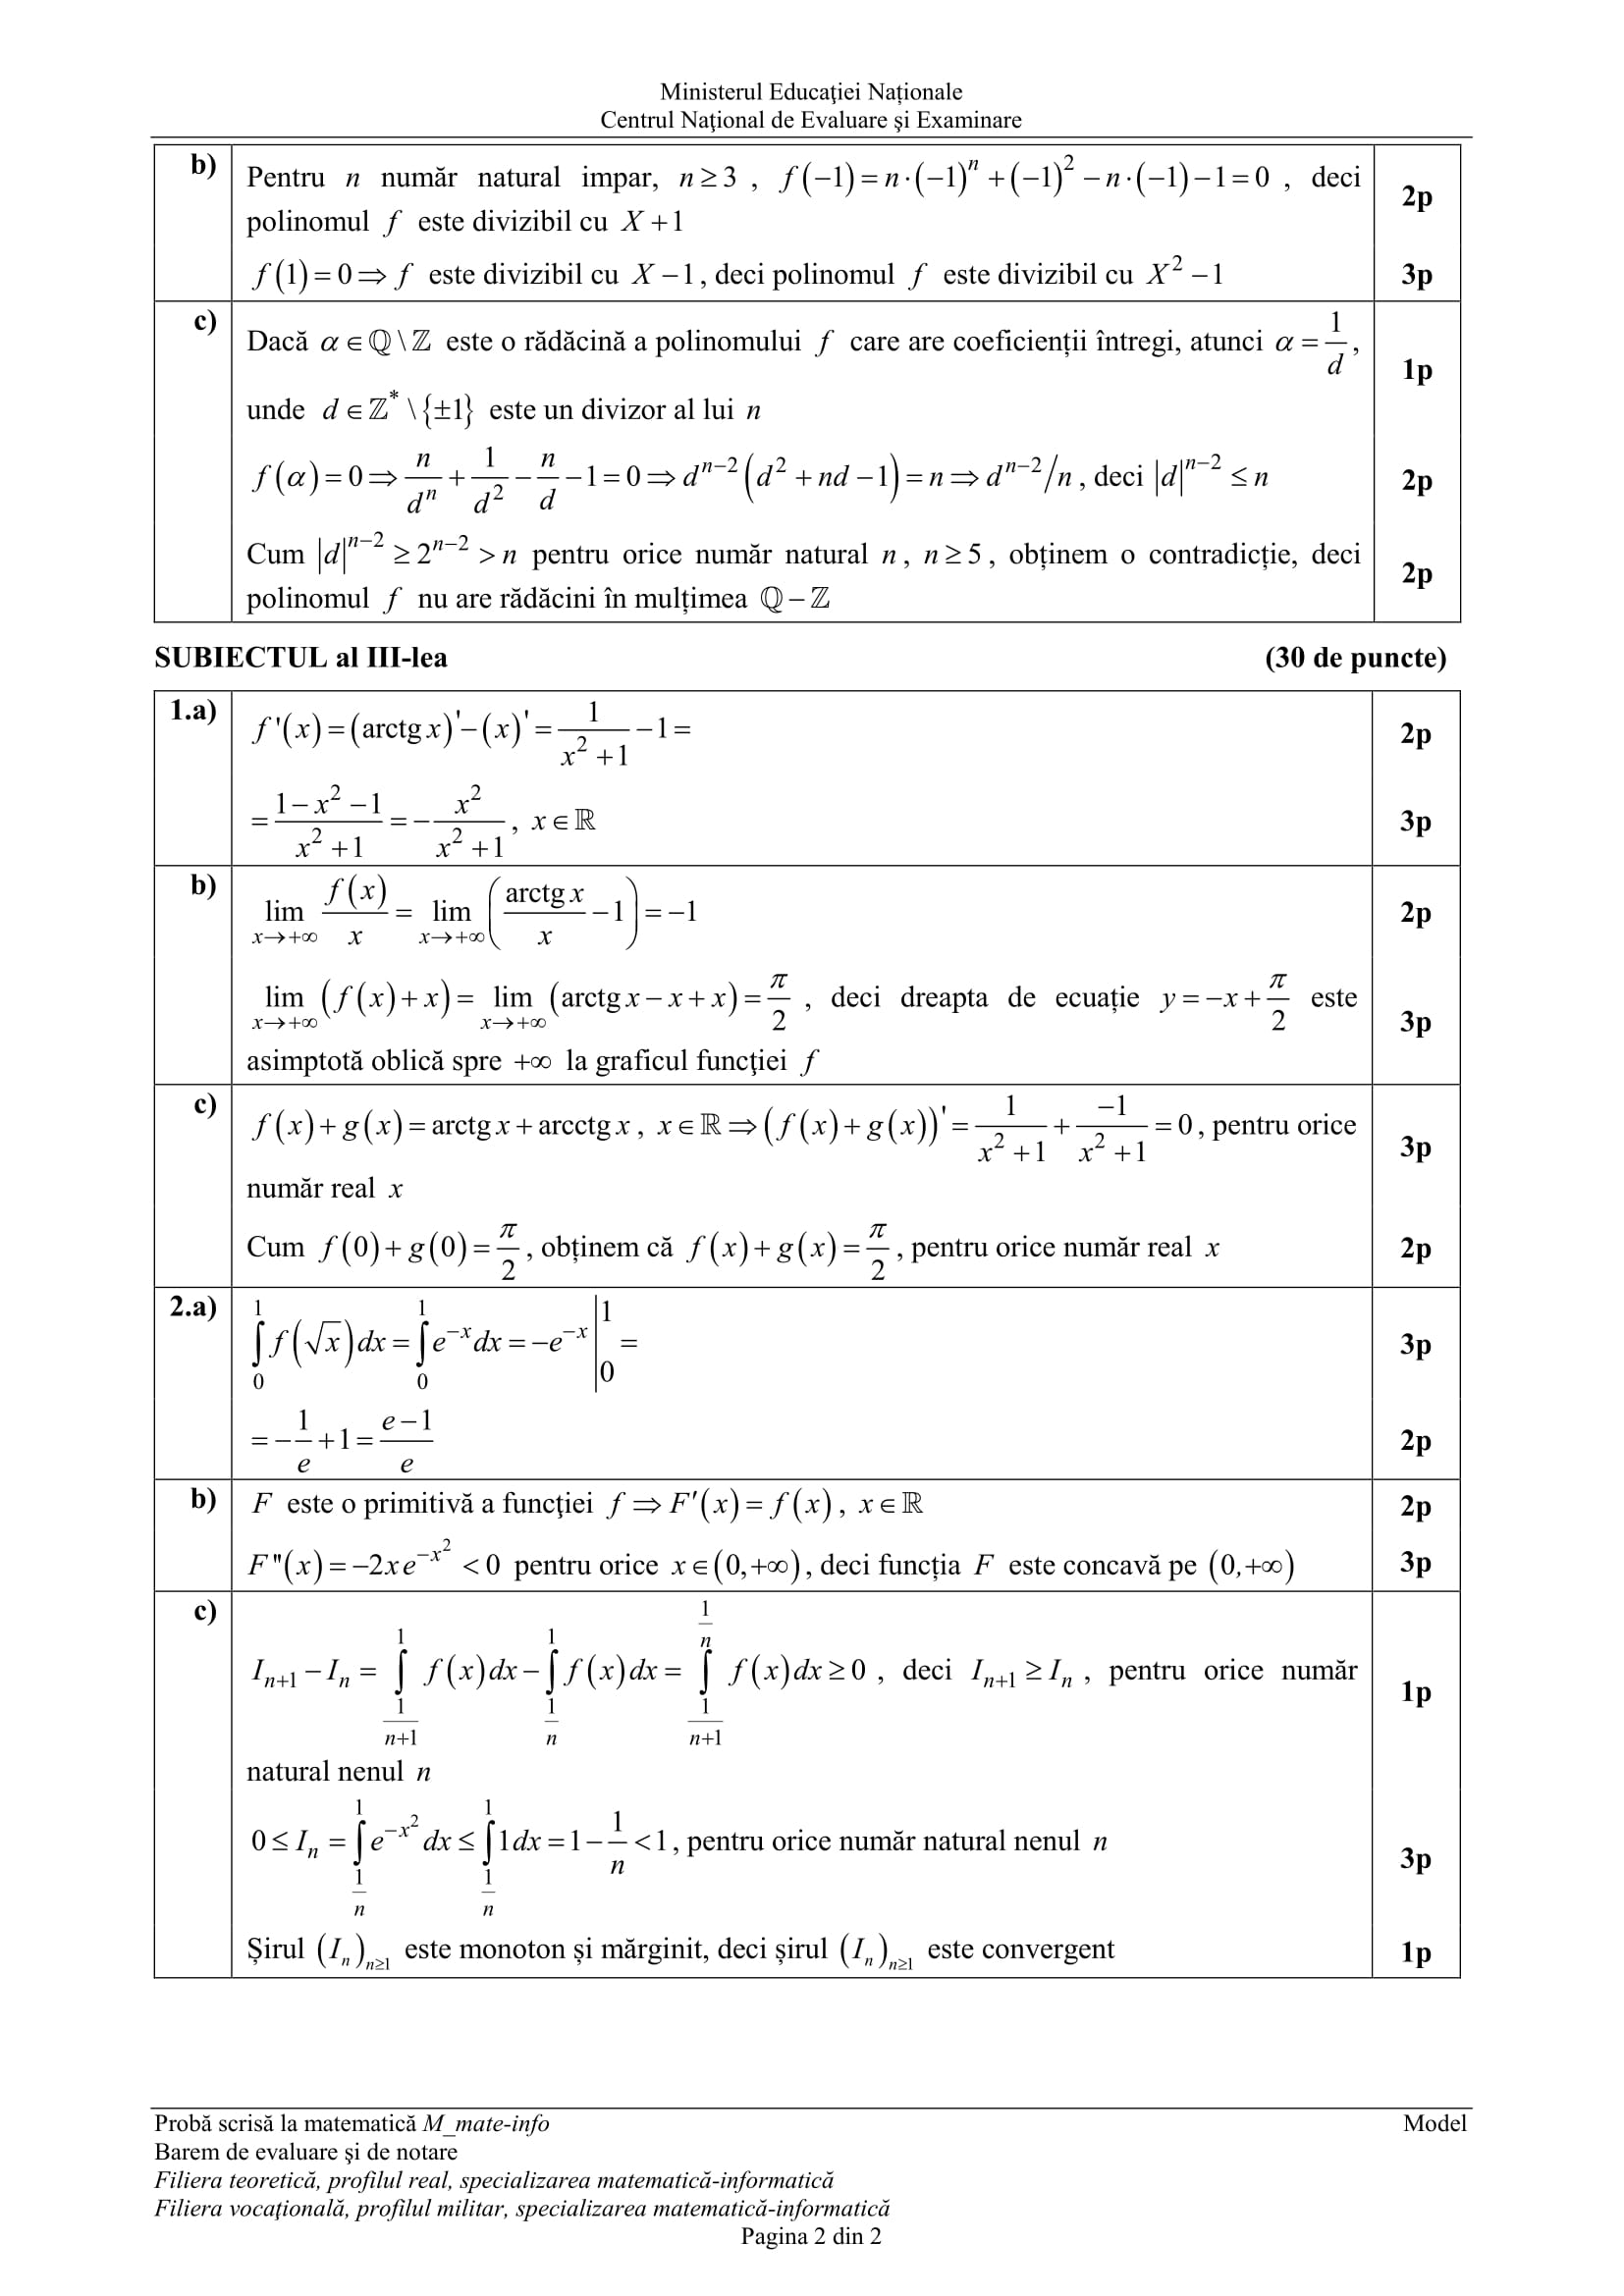 E_c_matematica_M_mate-info_2018_varianta_model